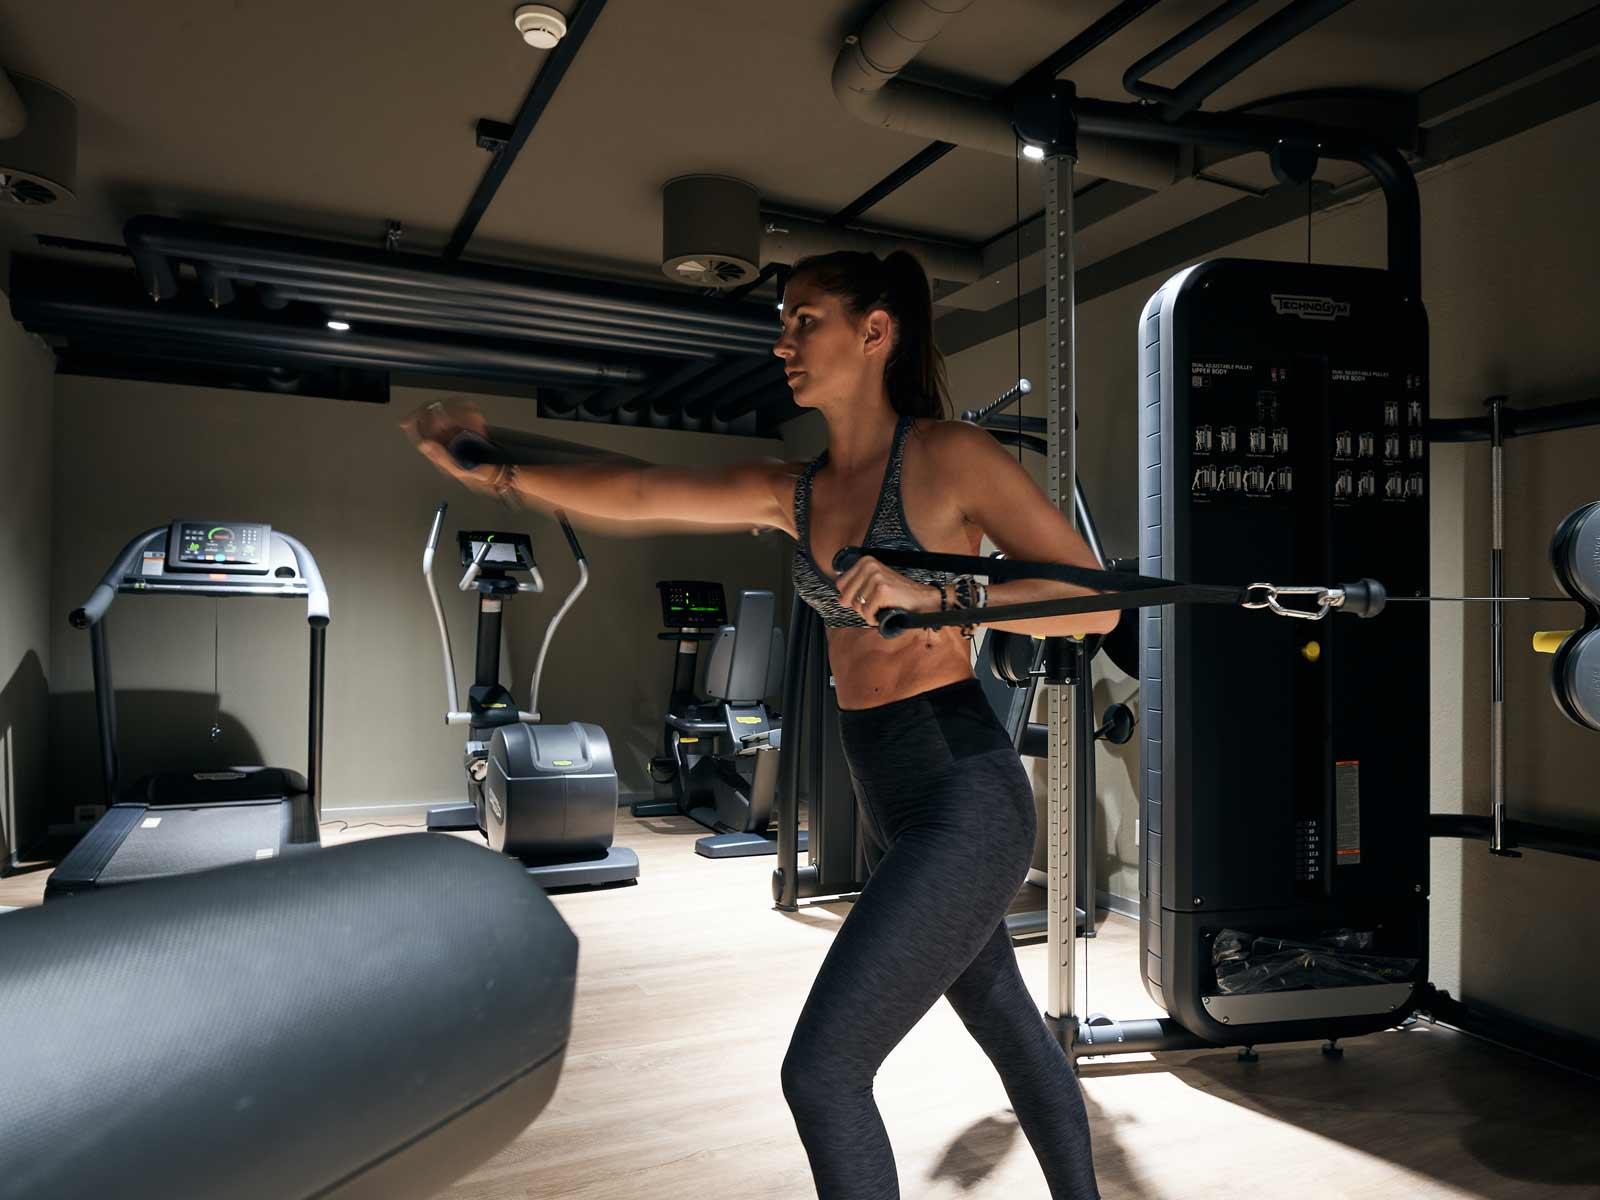 Frau beim Trainieren